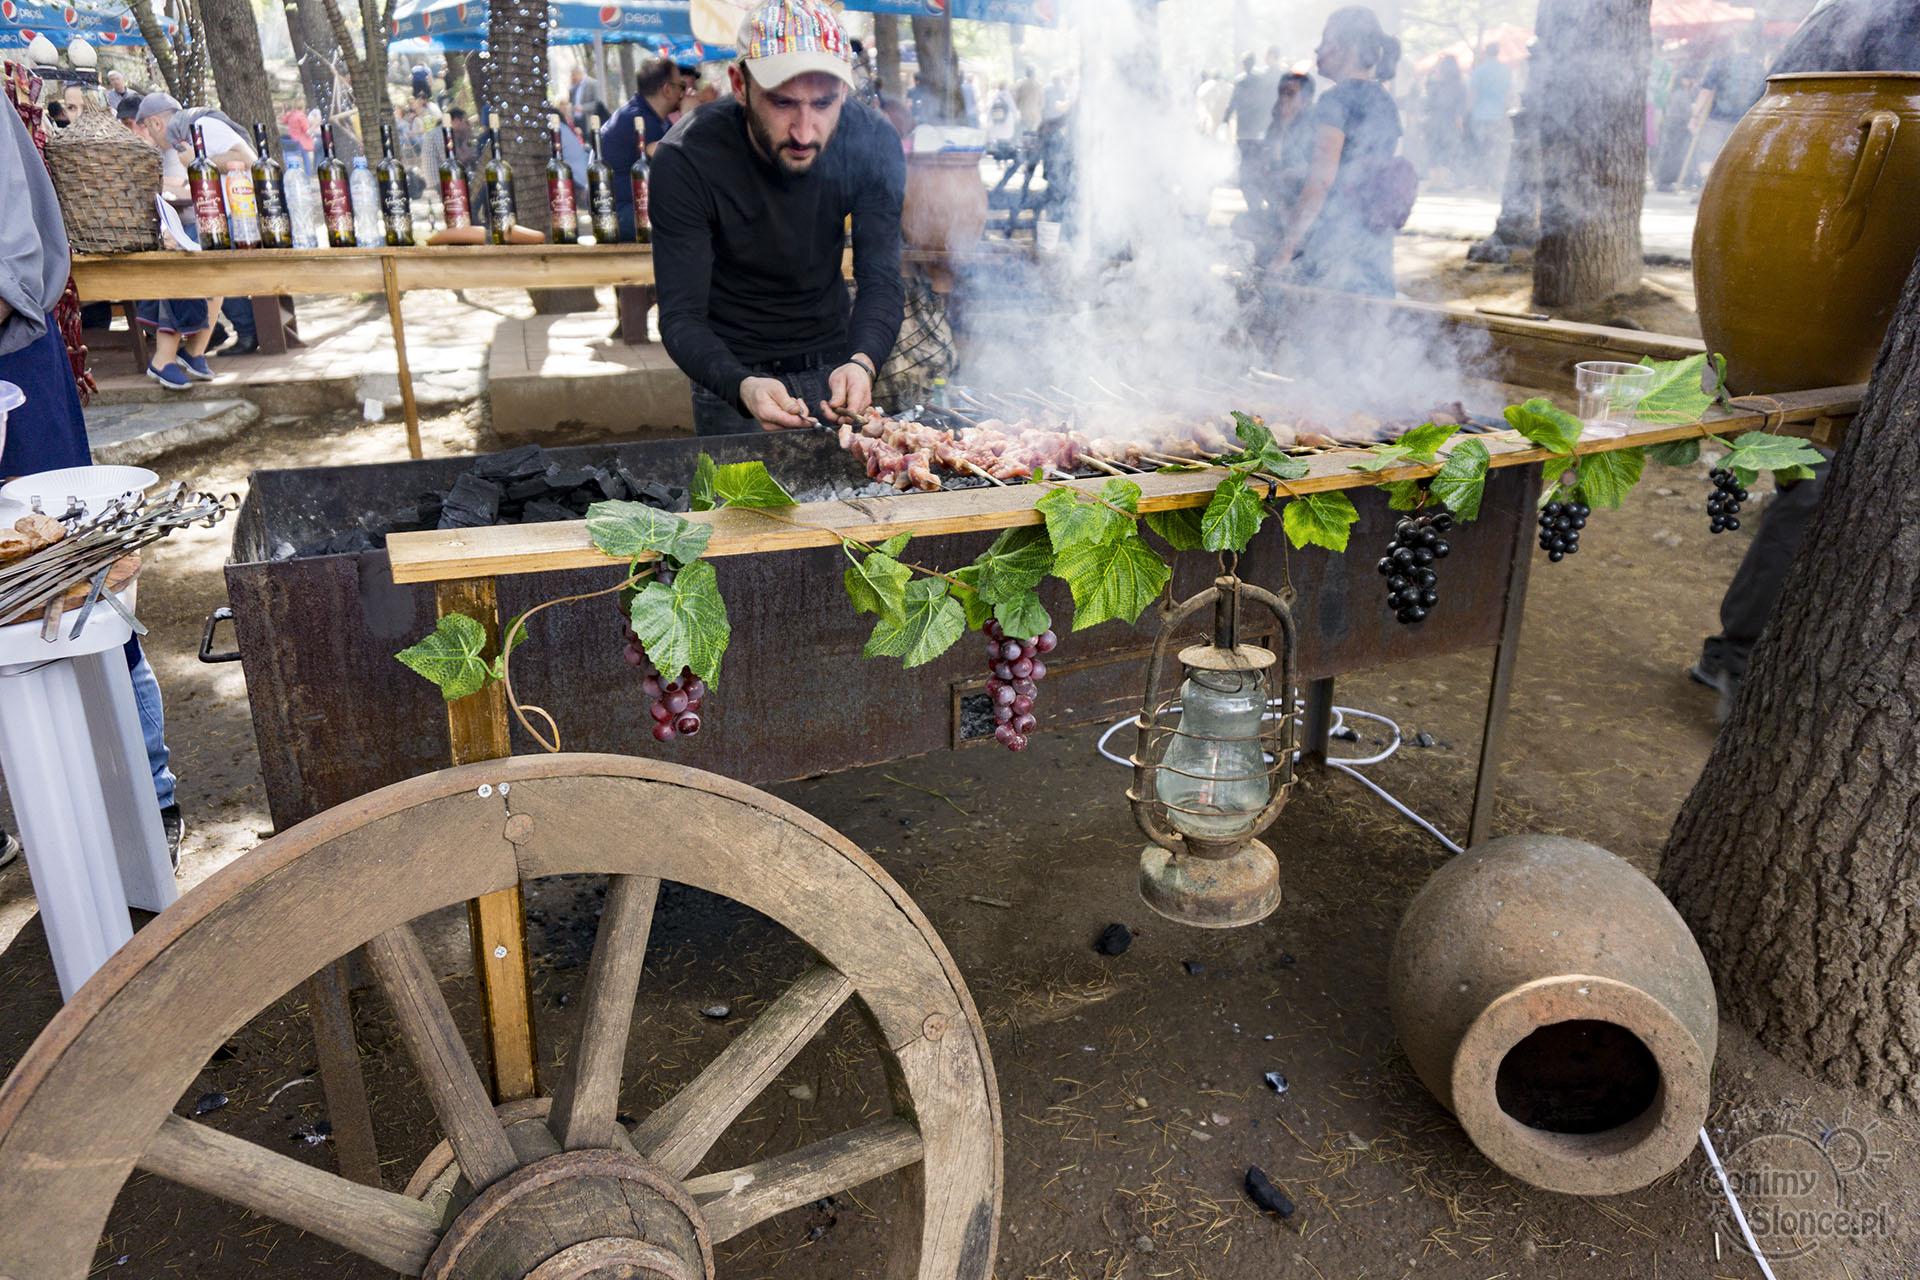 Festiwal Młodego Wina - grill i wino w Tbilisi - Mtatsminda Park